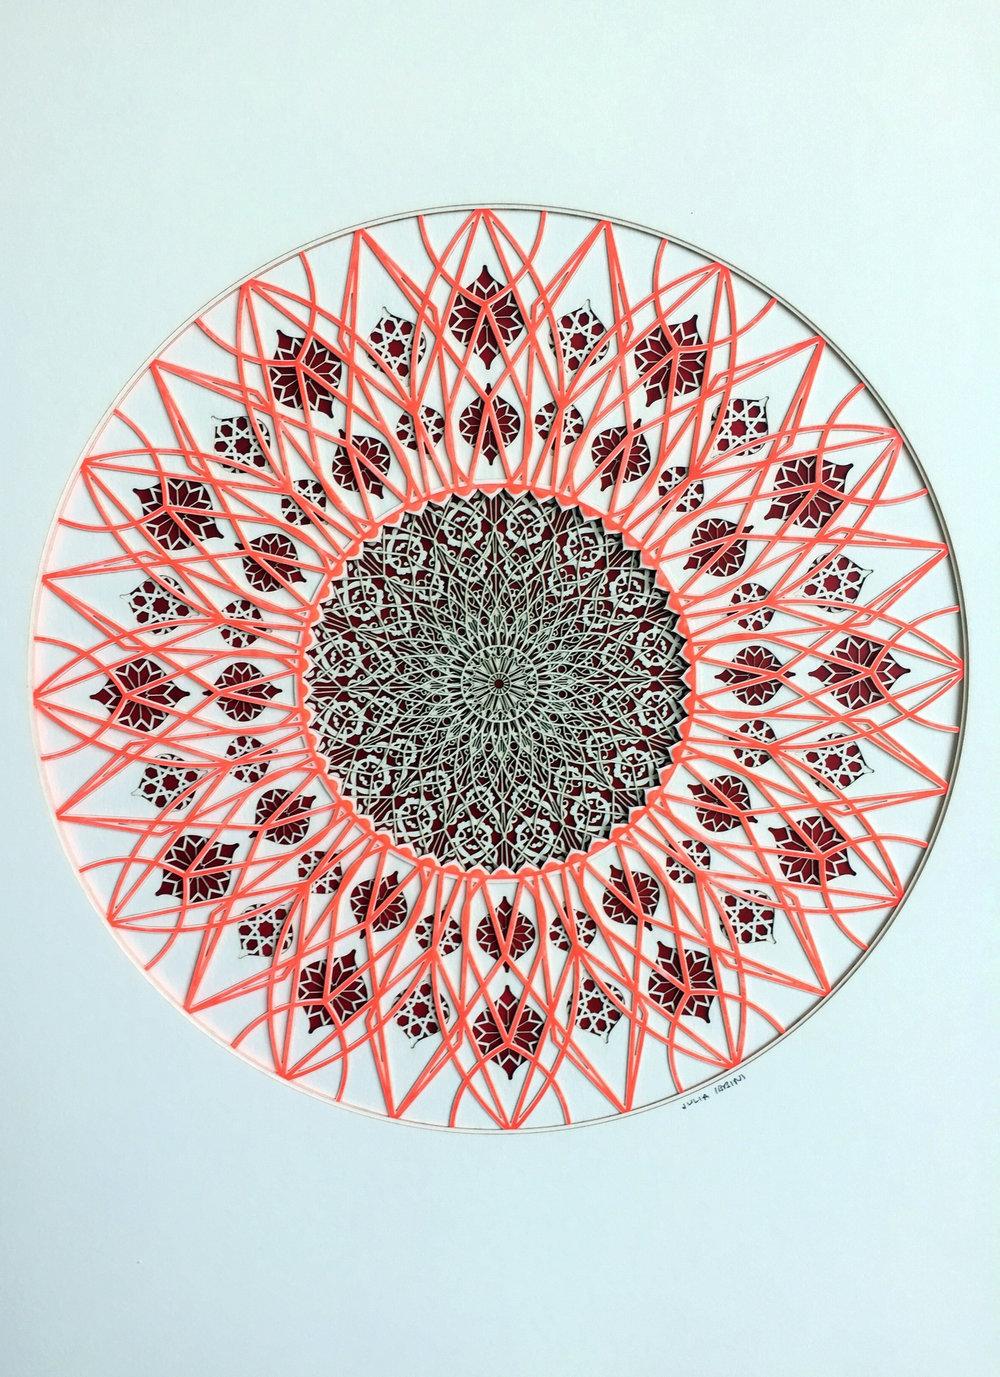 Julia Ibbini,  Cadmium Lines (Circle Studies) , 2017, 19 x 15 x 1.5 inches framed, photo courtesy of the artist